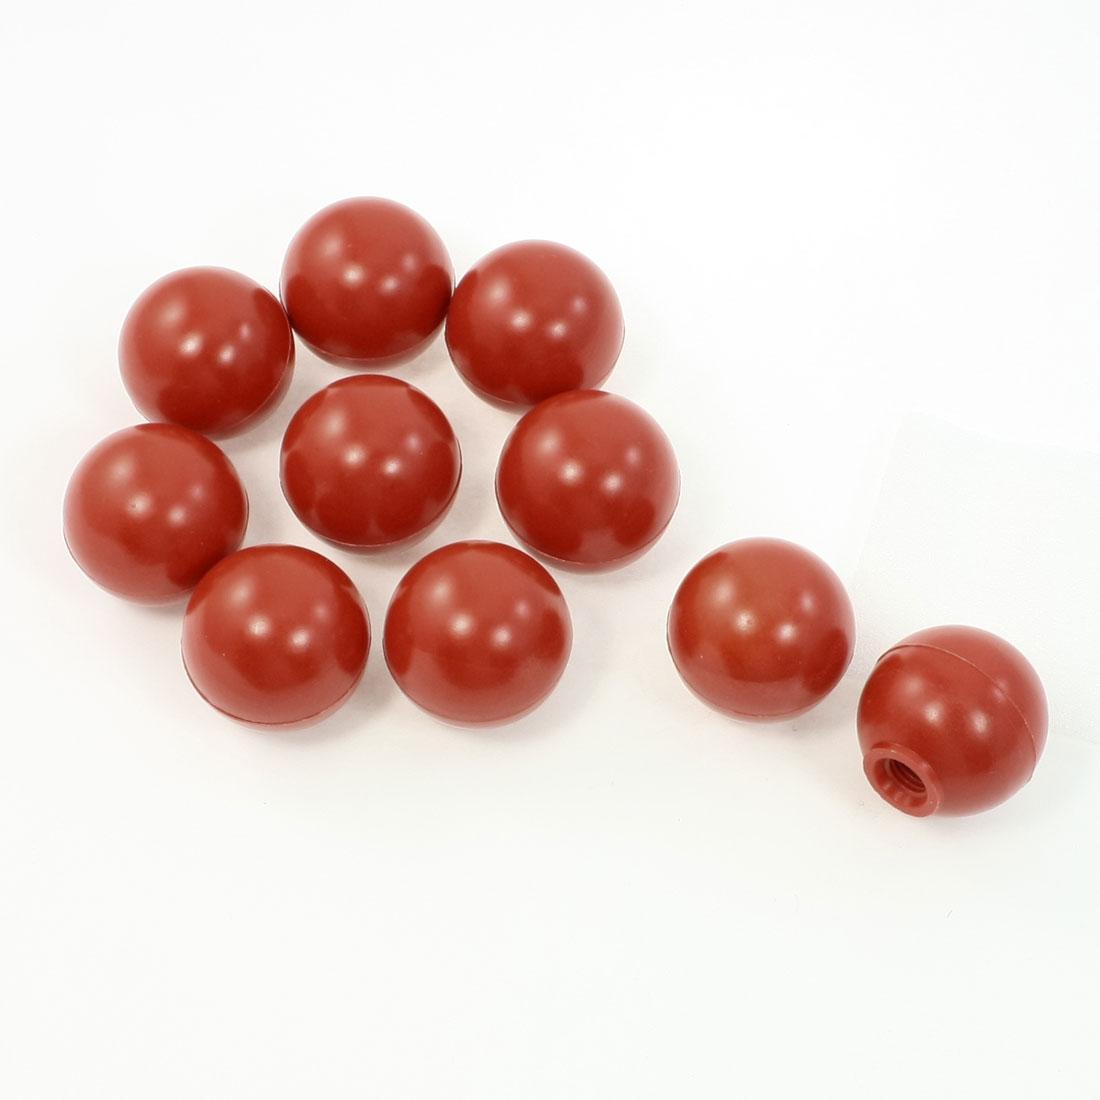 10Pcs Threaded Joystick Ball Knob Machine Control Handle Red 38mm Dia 10mm Bore